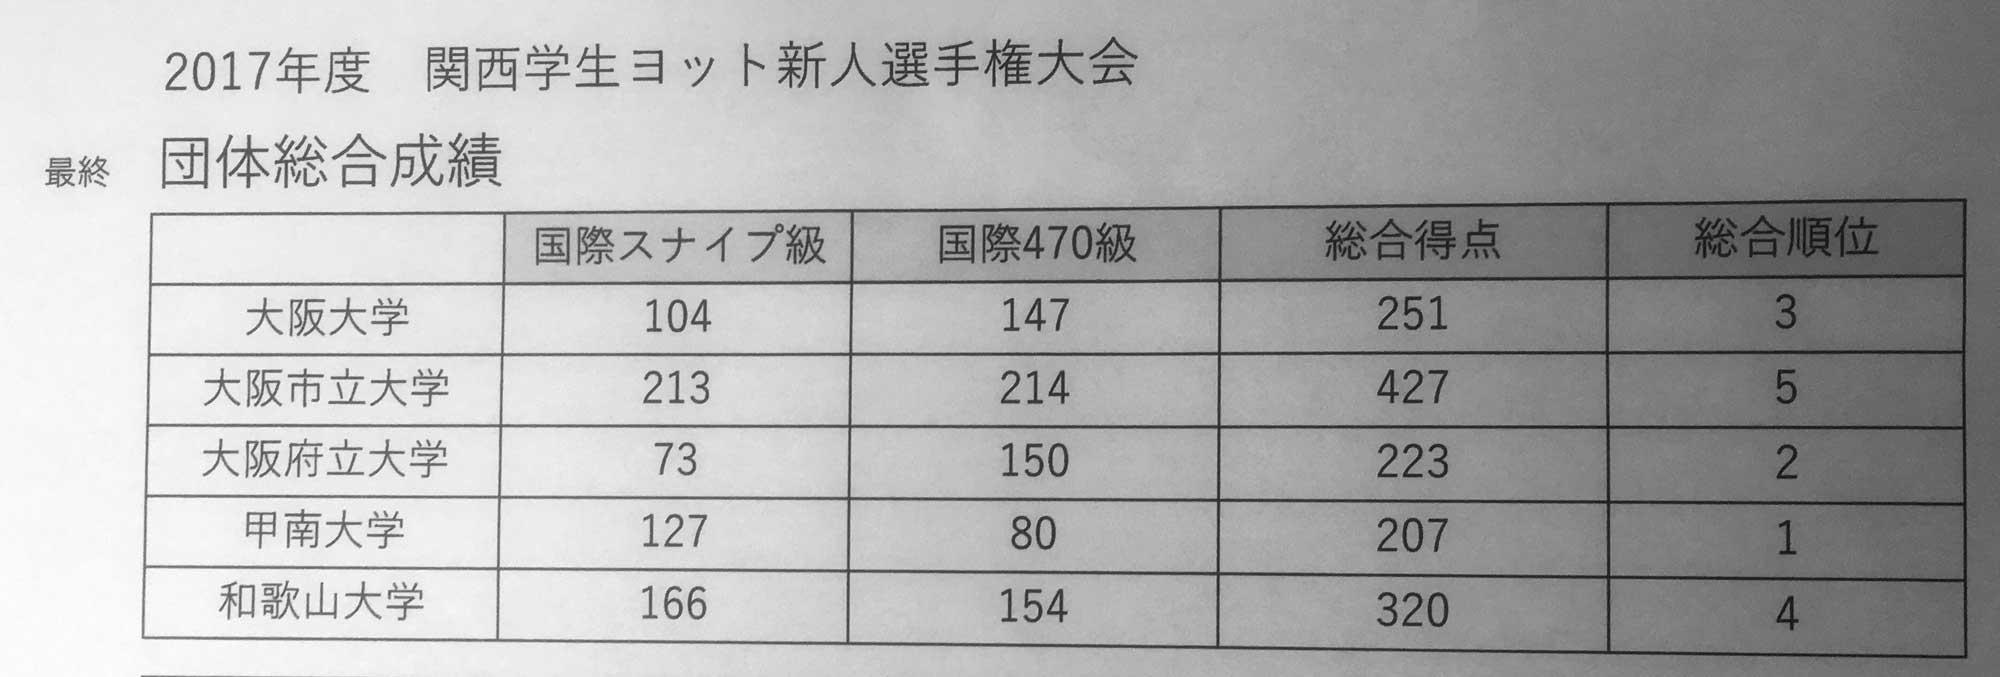 2017-11-28_result